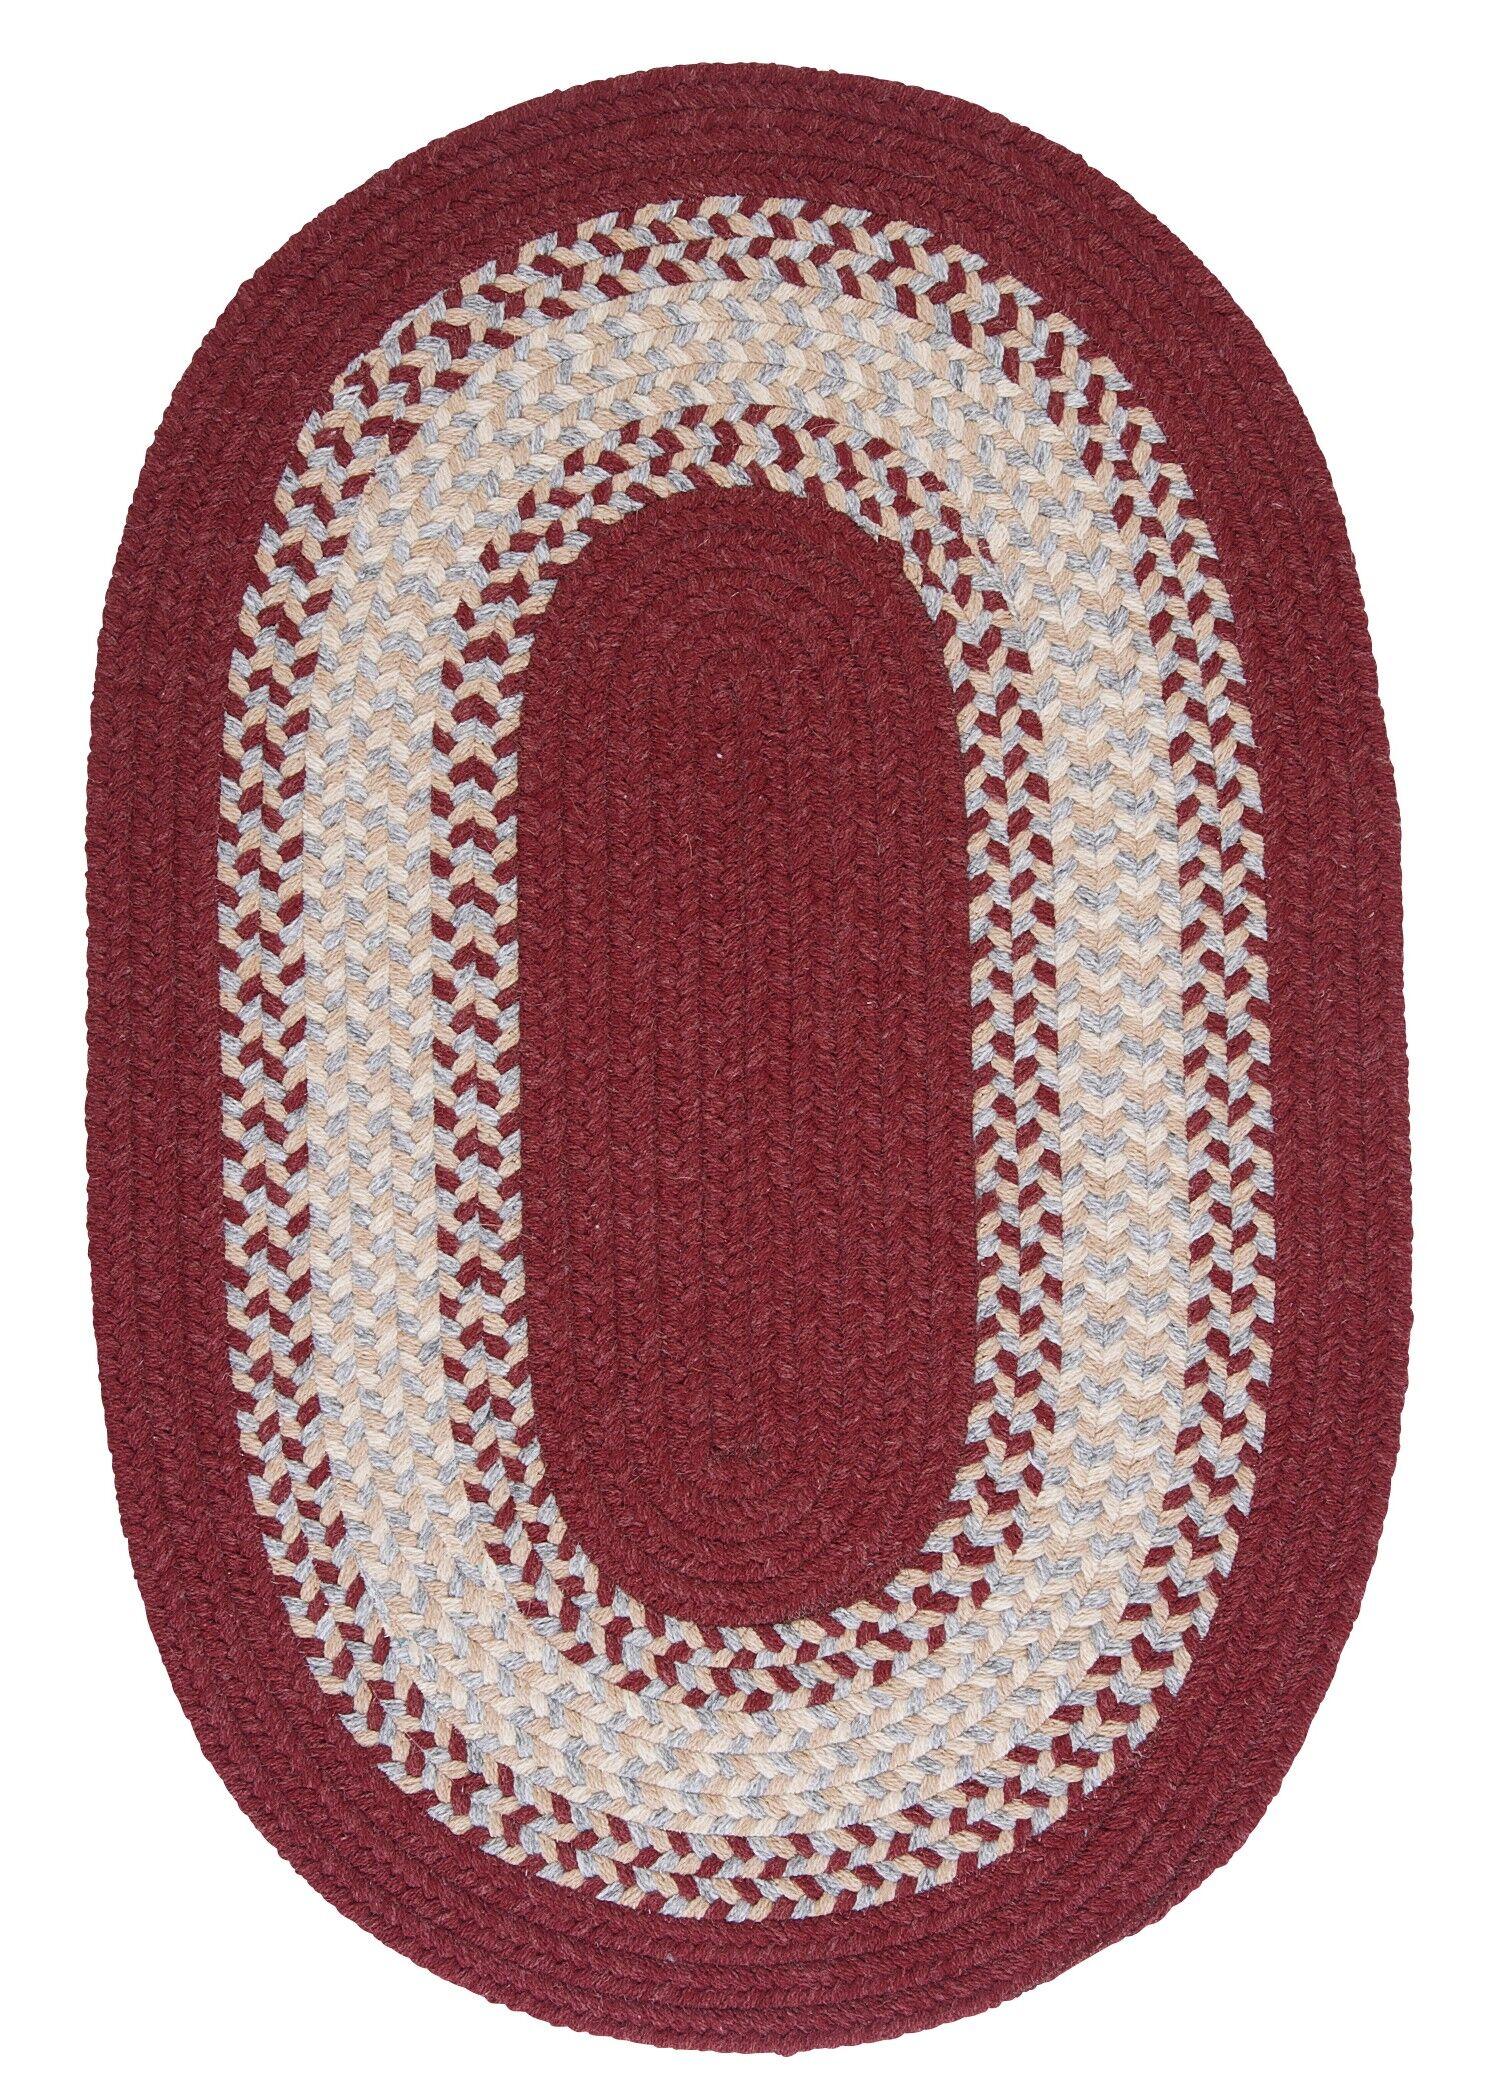 Serafin Berry Area Rug Rug Size: Oval 2' x 4'